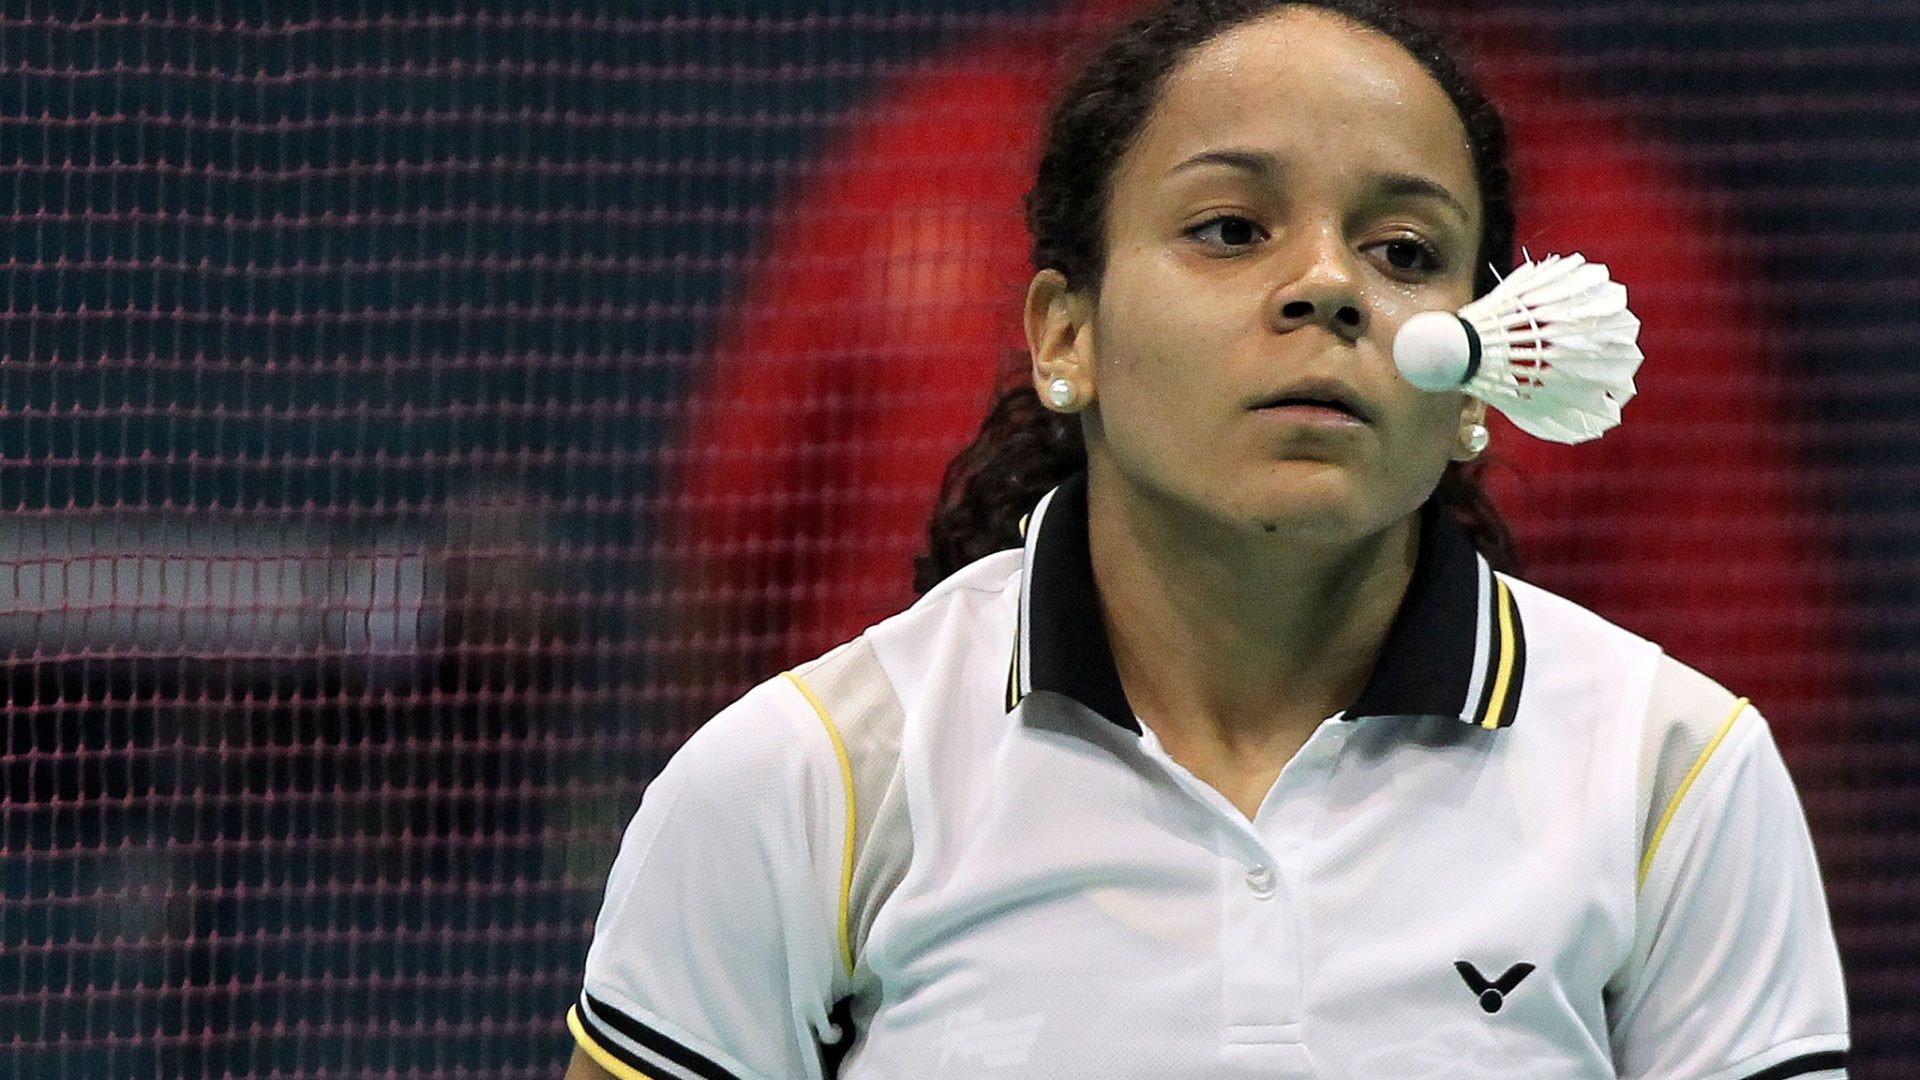 Fabiana da Silva observa peteca durante partida contra a canadense Michelle Li no badminton pelos Jogos Pan-Americanos de Guadalajara (15/10/2011)